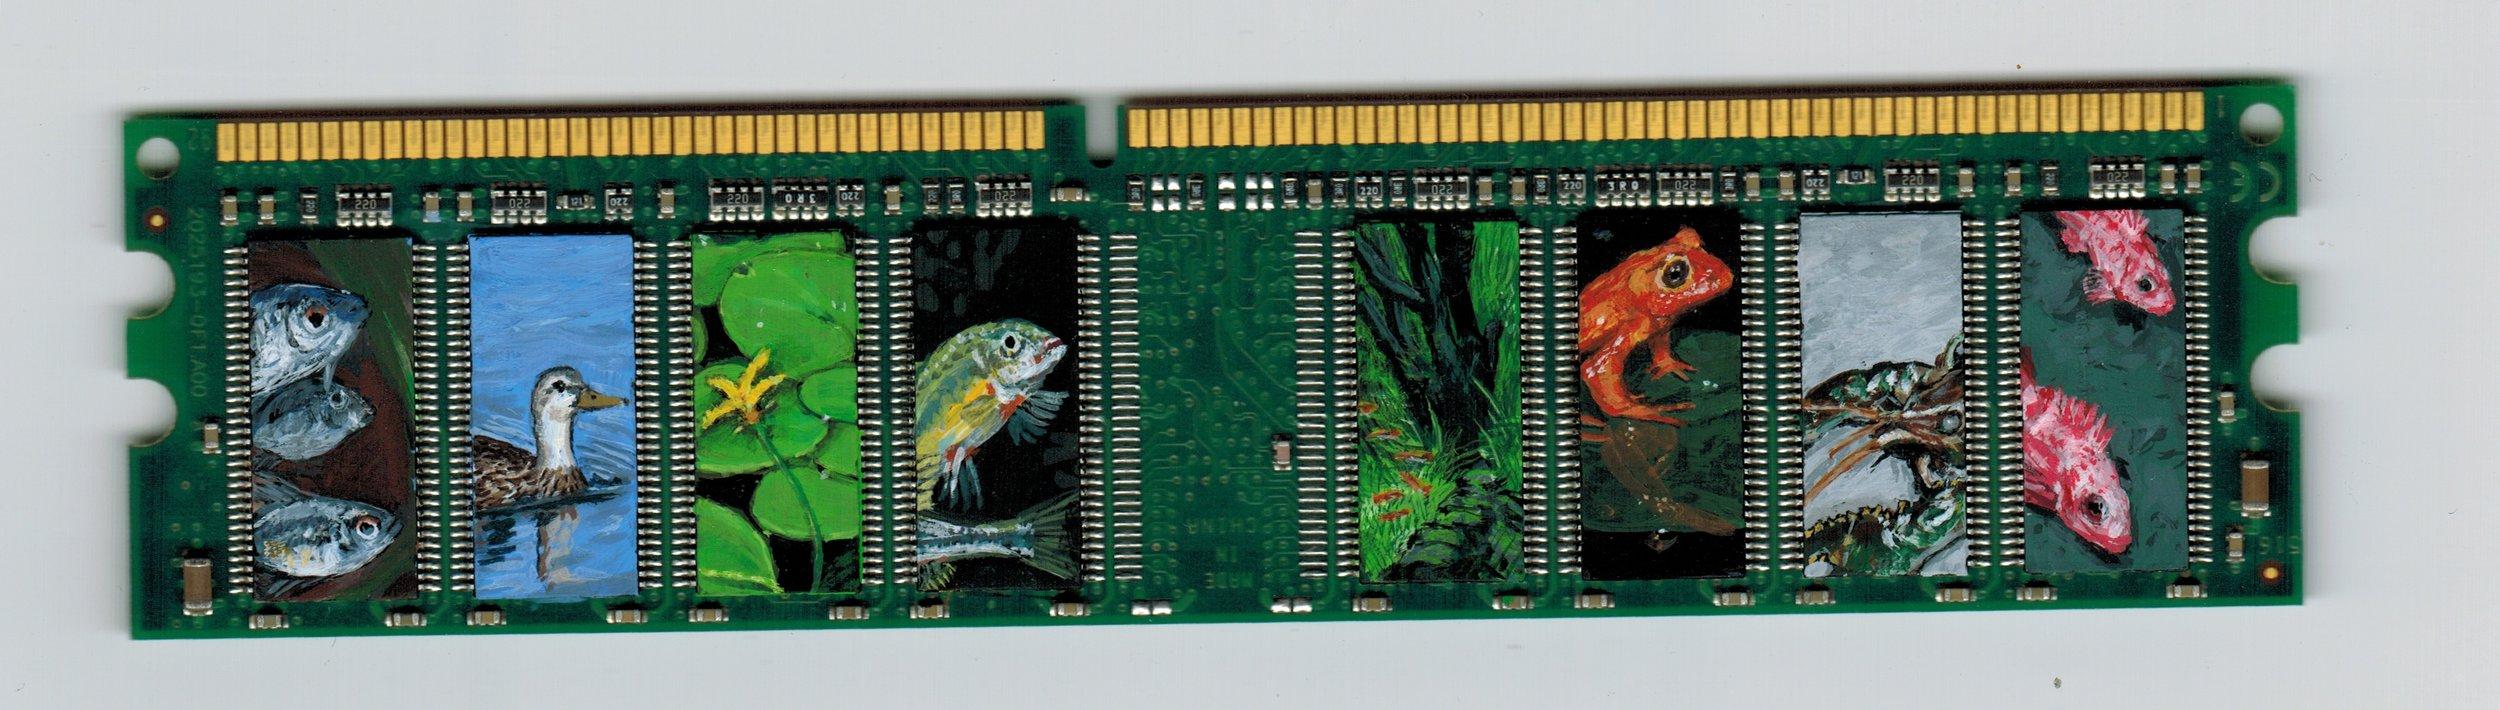 ecosystem-microchip.jpeg